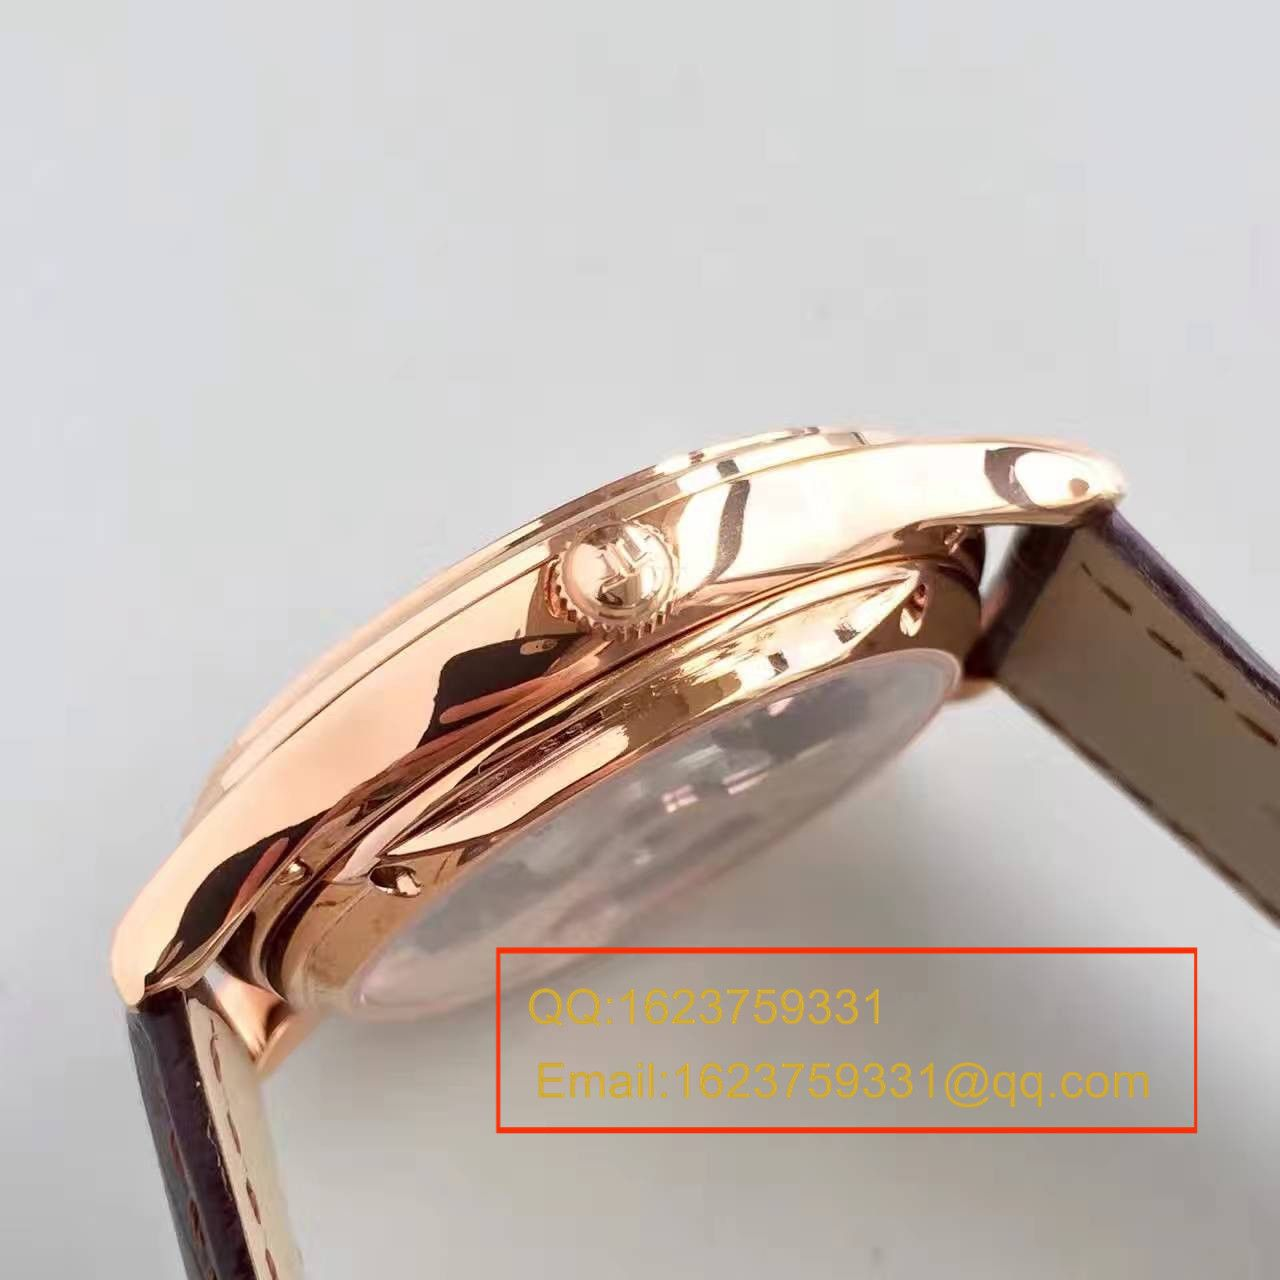 【LH一比一超A高仿手表】积家Master超薄大师系列Q1322410自动陀飞轮腕表